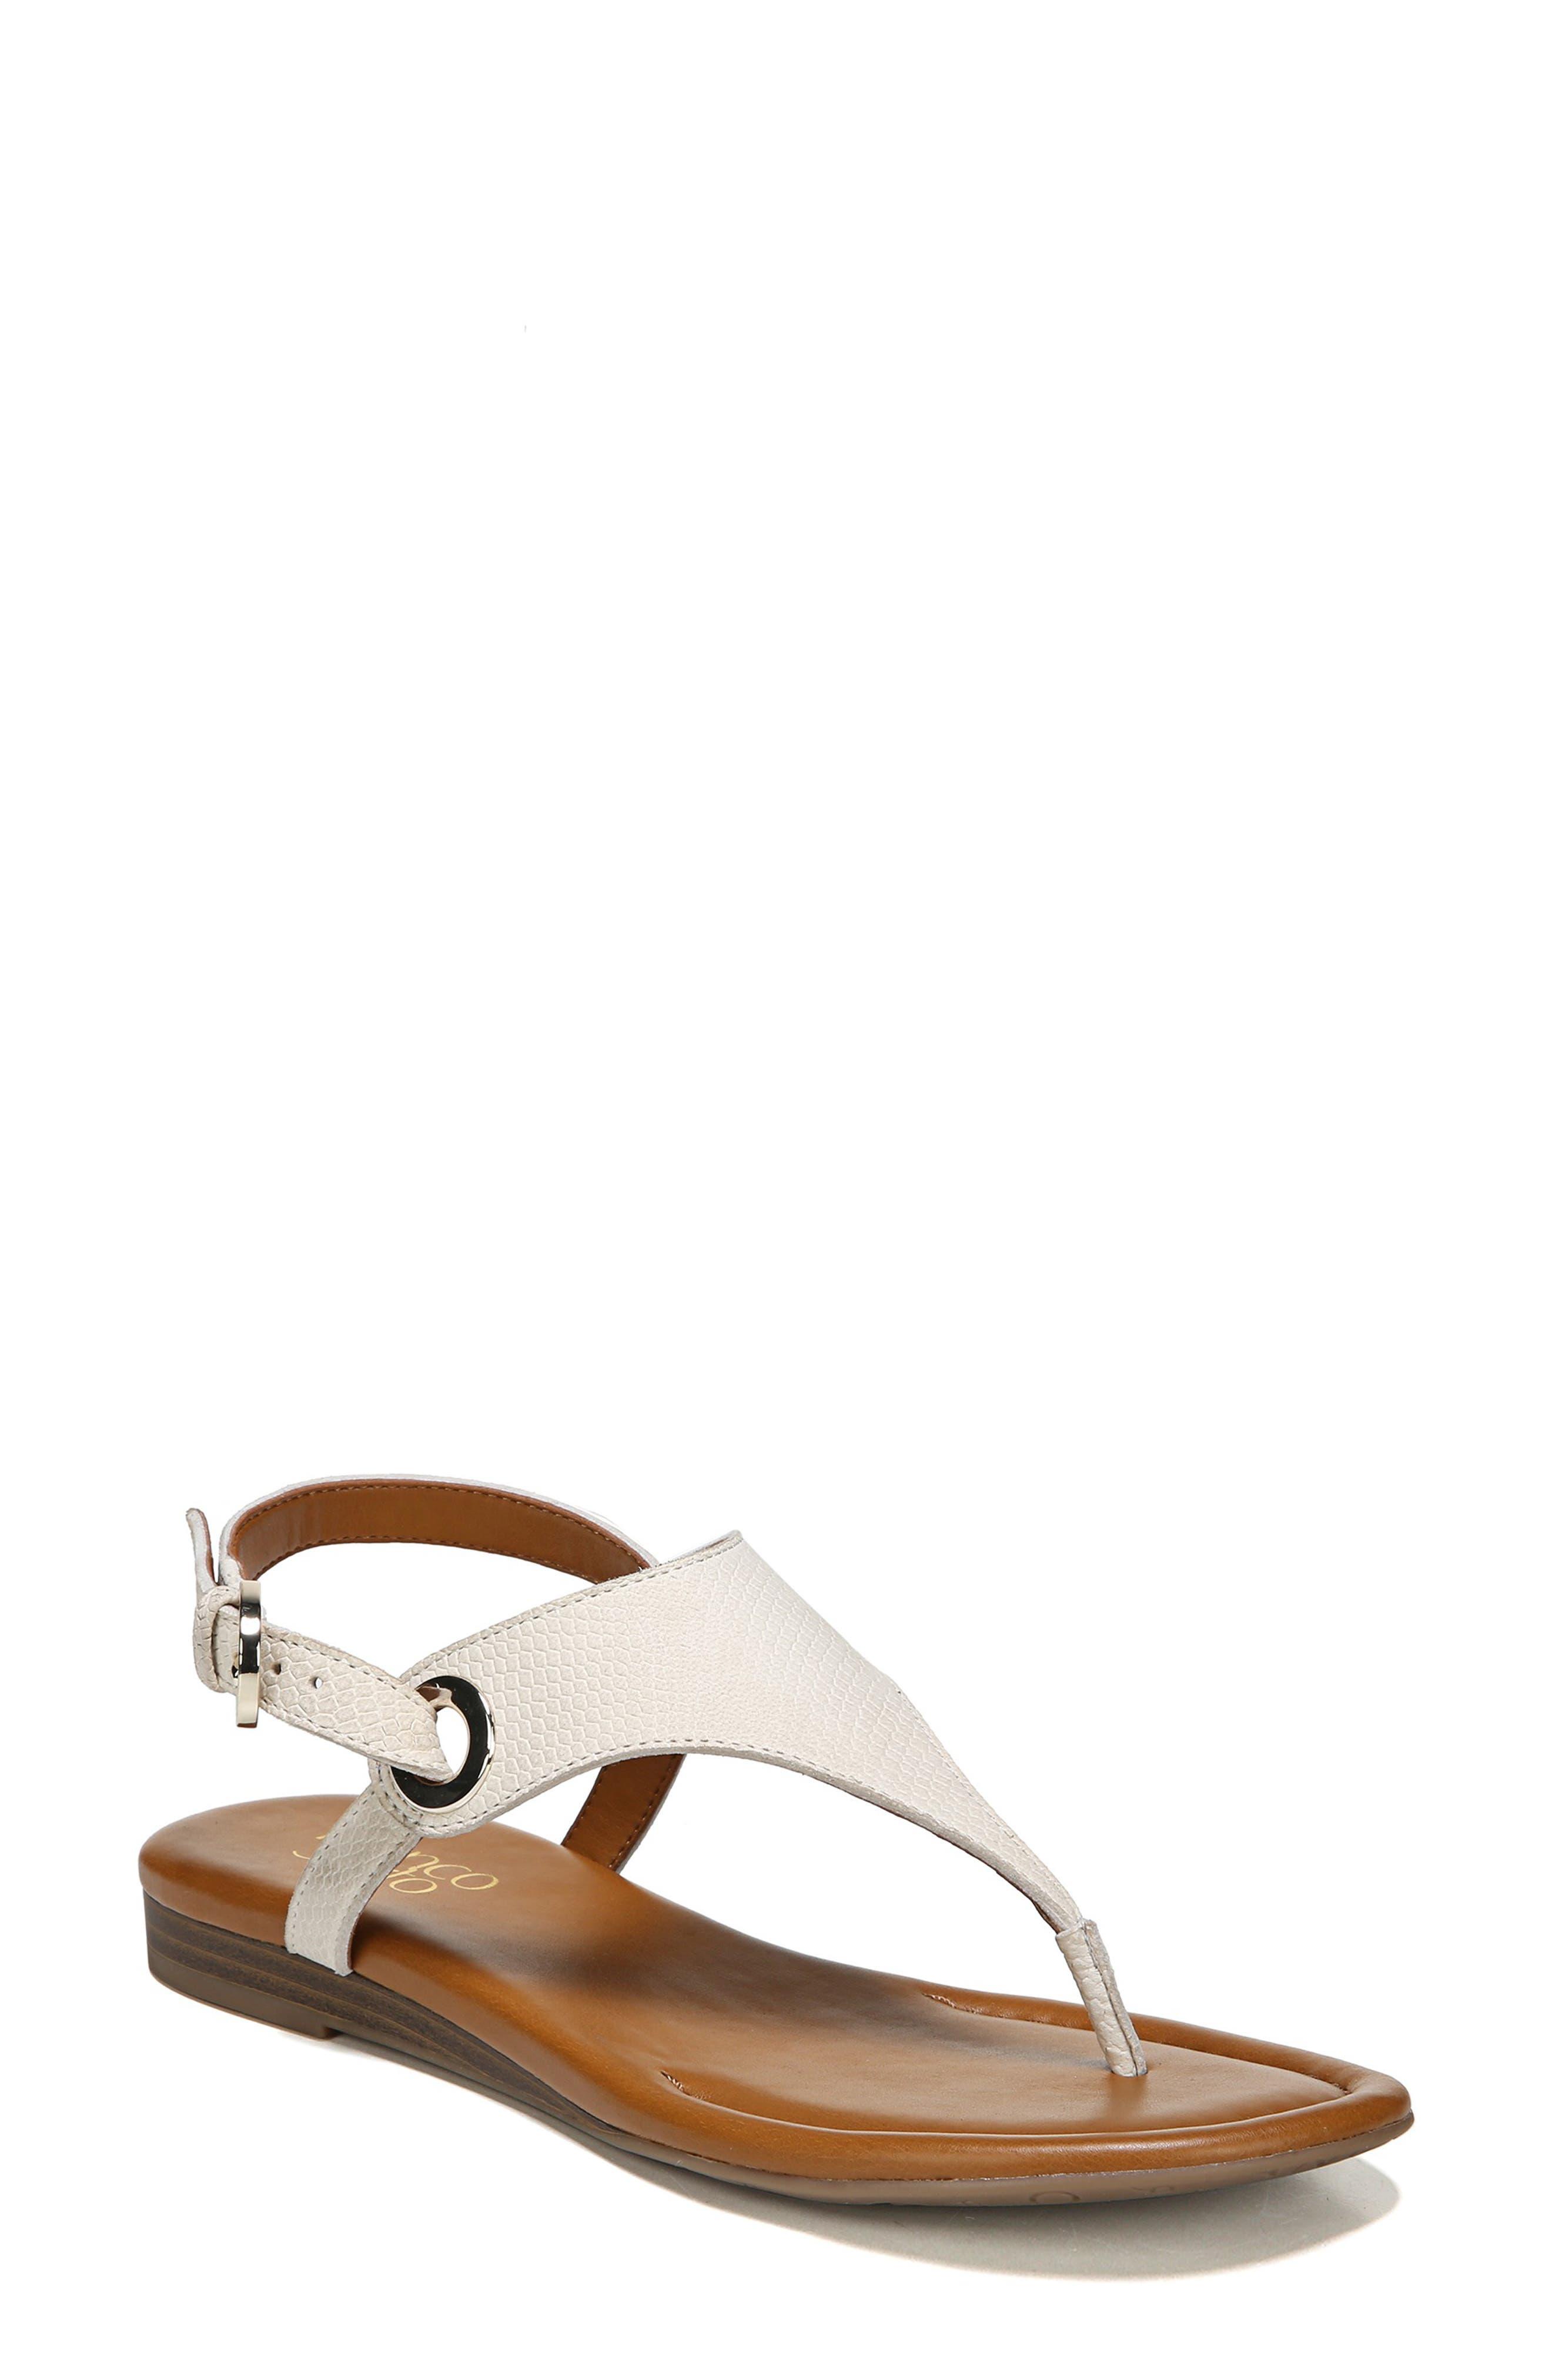 1e302537e9 Franco Sarto Sandals - Women's